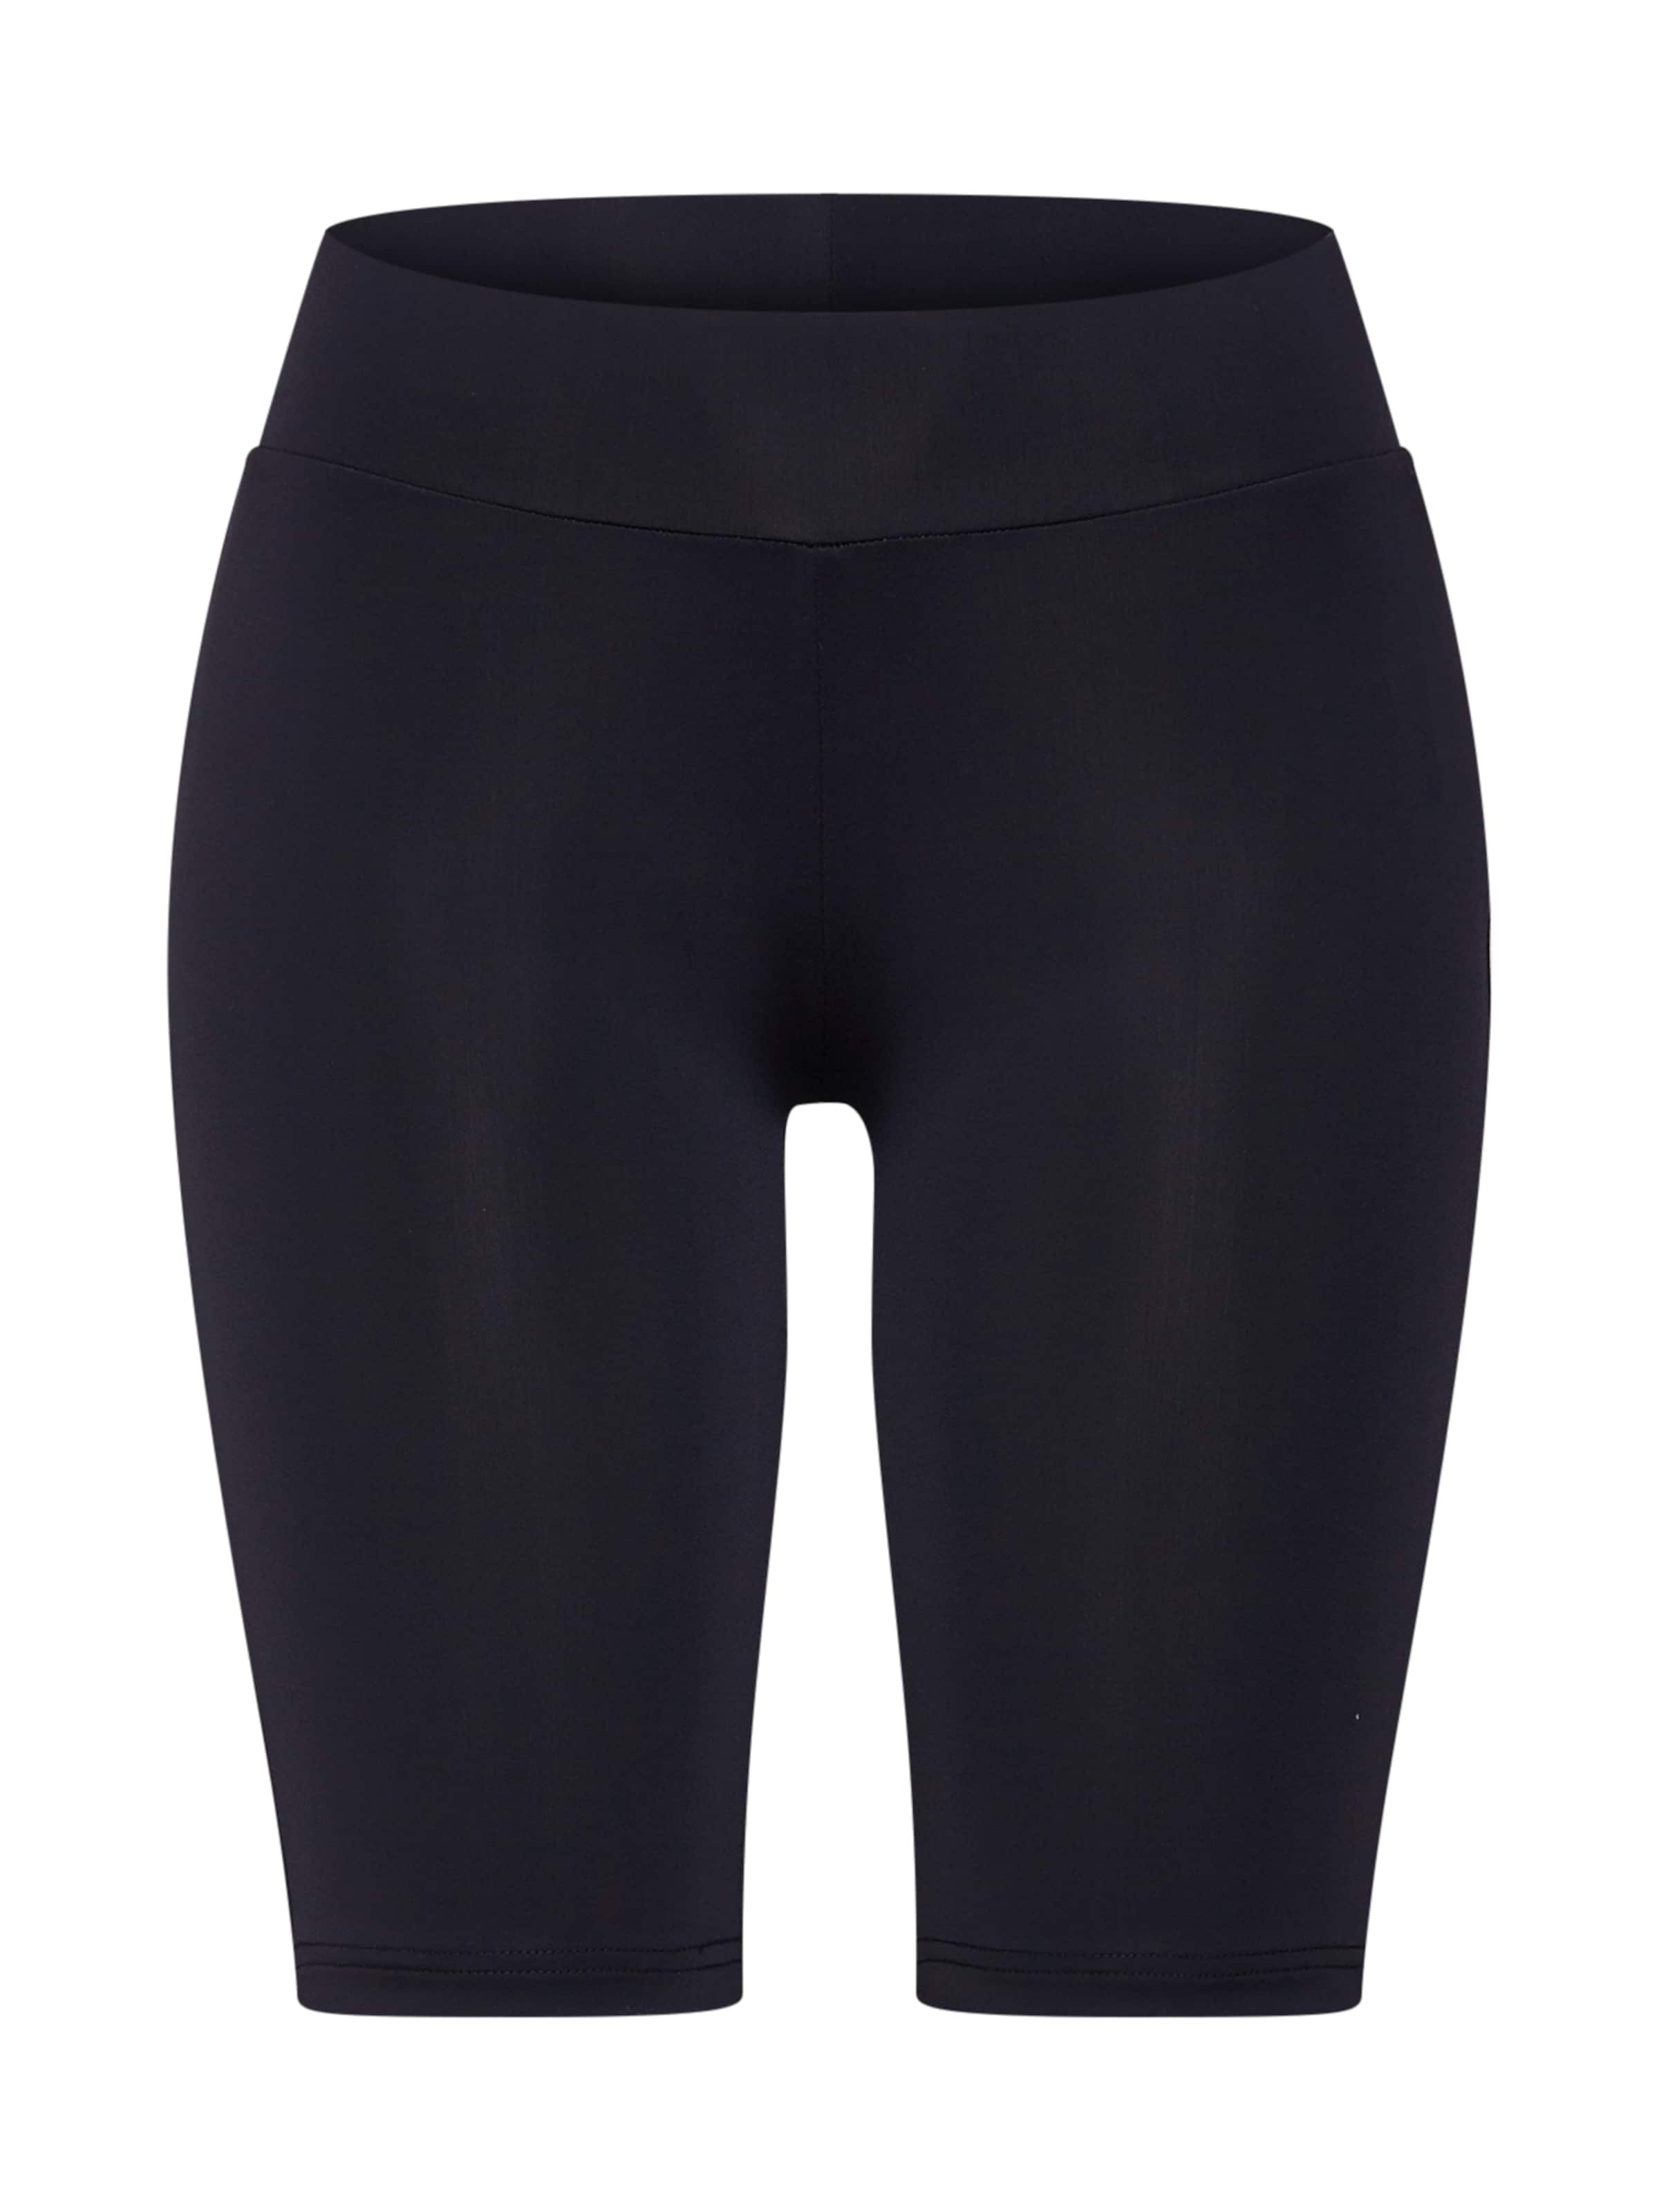 Urban Noir Leggings Shorts' Classics 'ladies Cycle En T13ulFKJc5